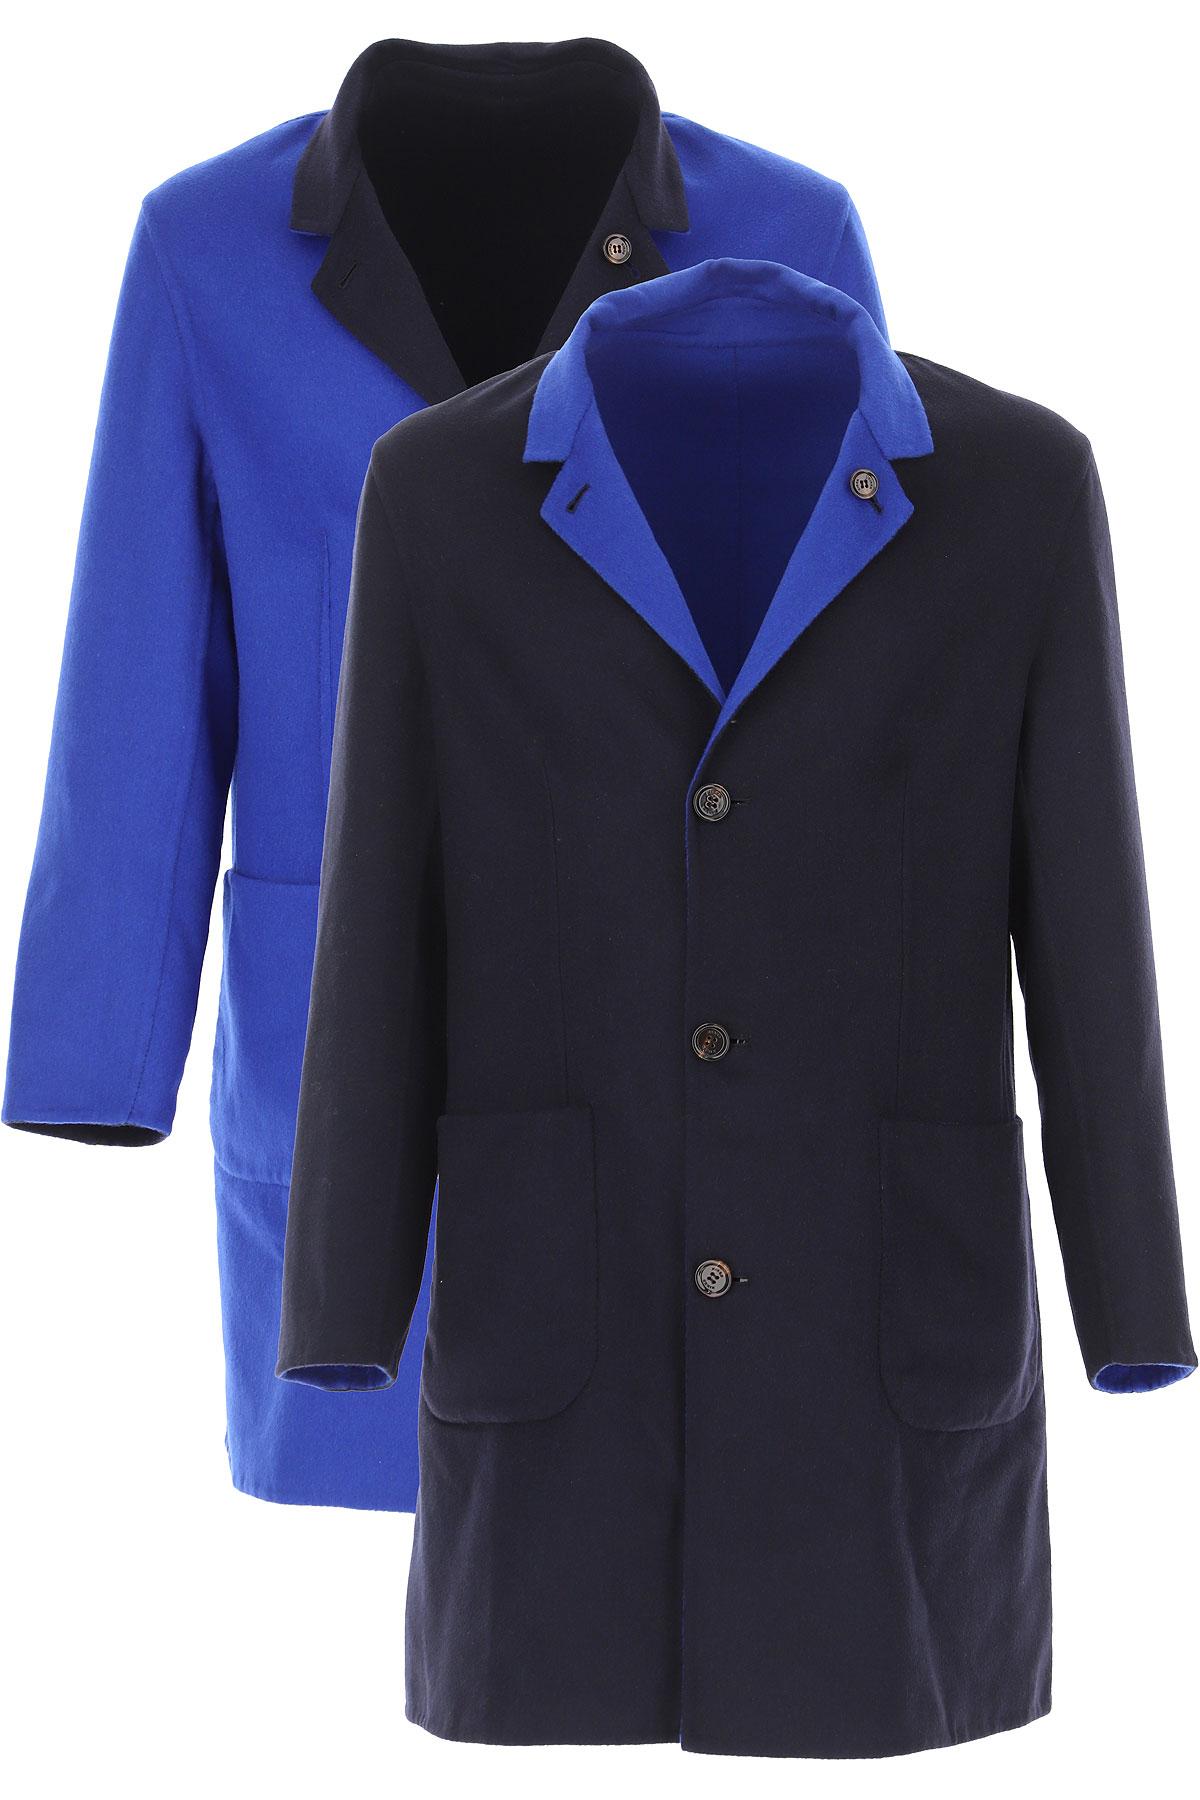 Kired Men's Coat On Sale, navy, Cashemere, 2019, L M XL